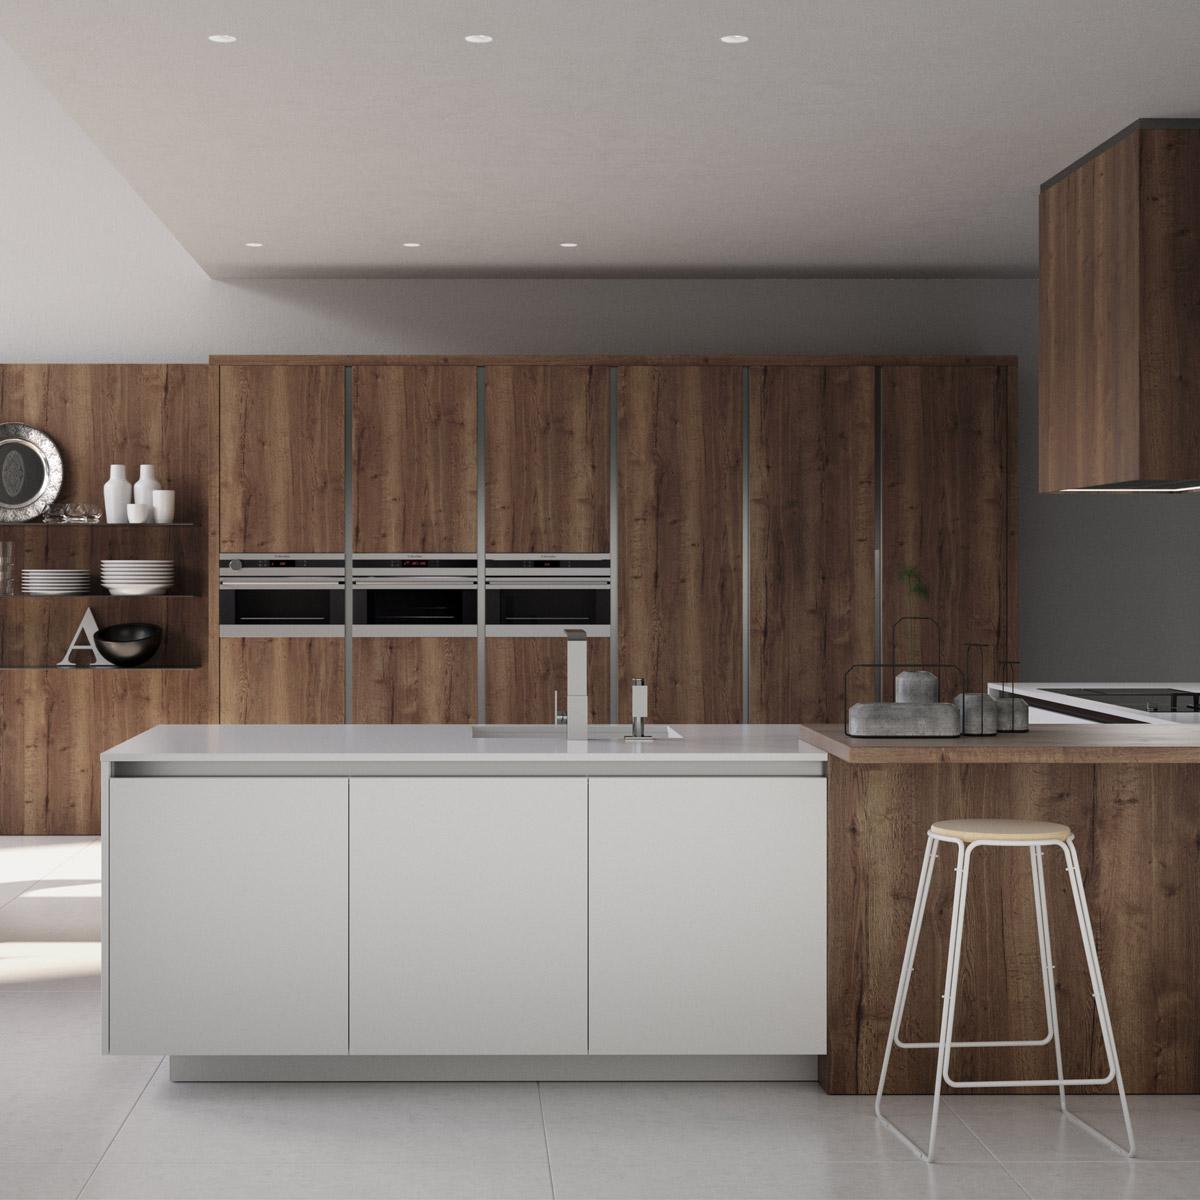 ambitcuines-marina-muebles-de-cocina